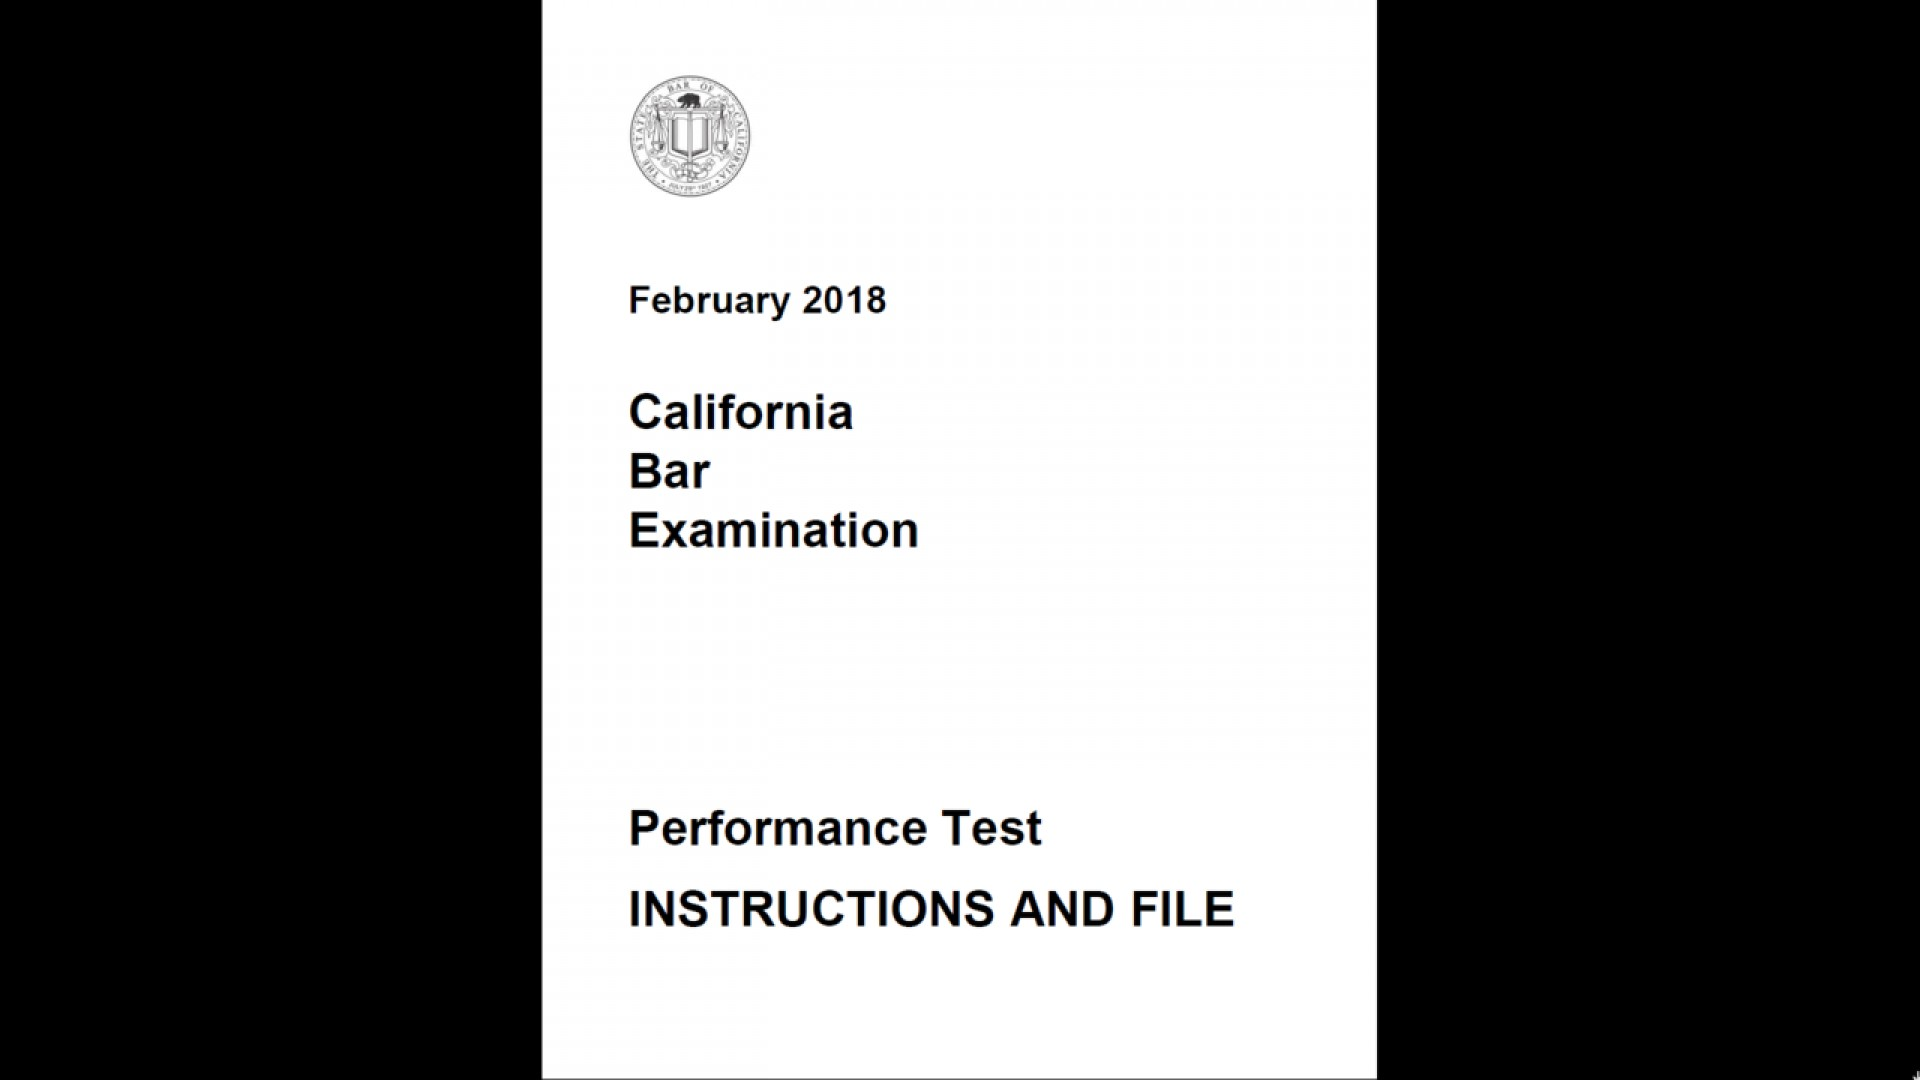 023 Essay Example California Bar Essays Ecnsu9grsogva9z49swz Firstframe Marvelous July 2017 Exam Graded February 2018 1920